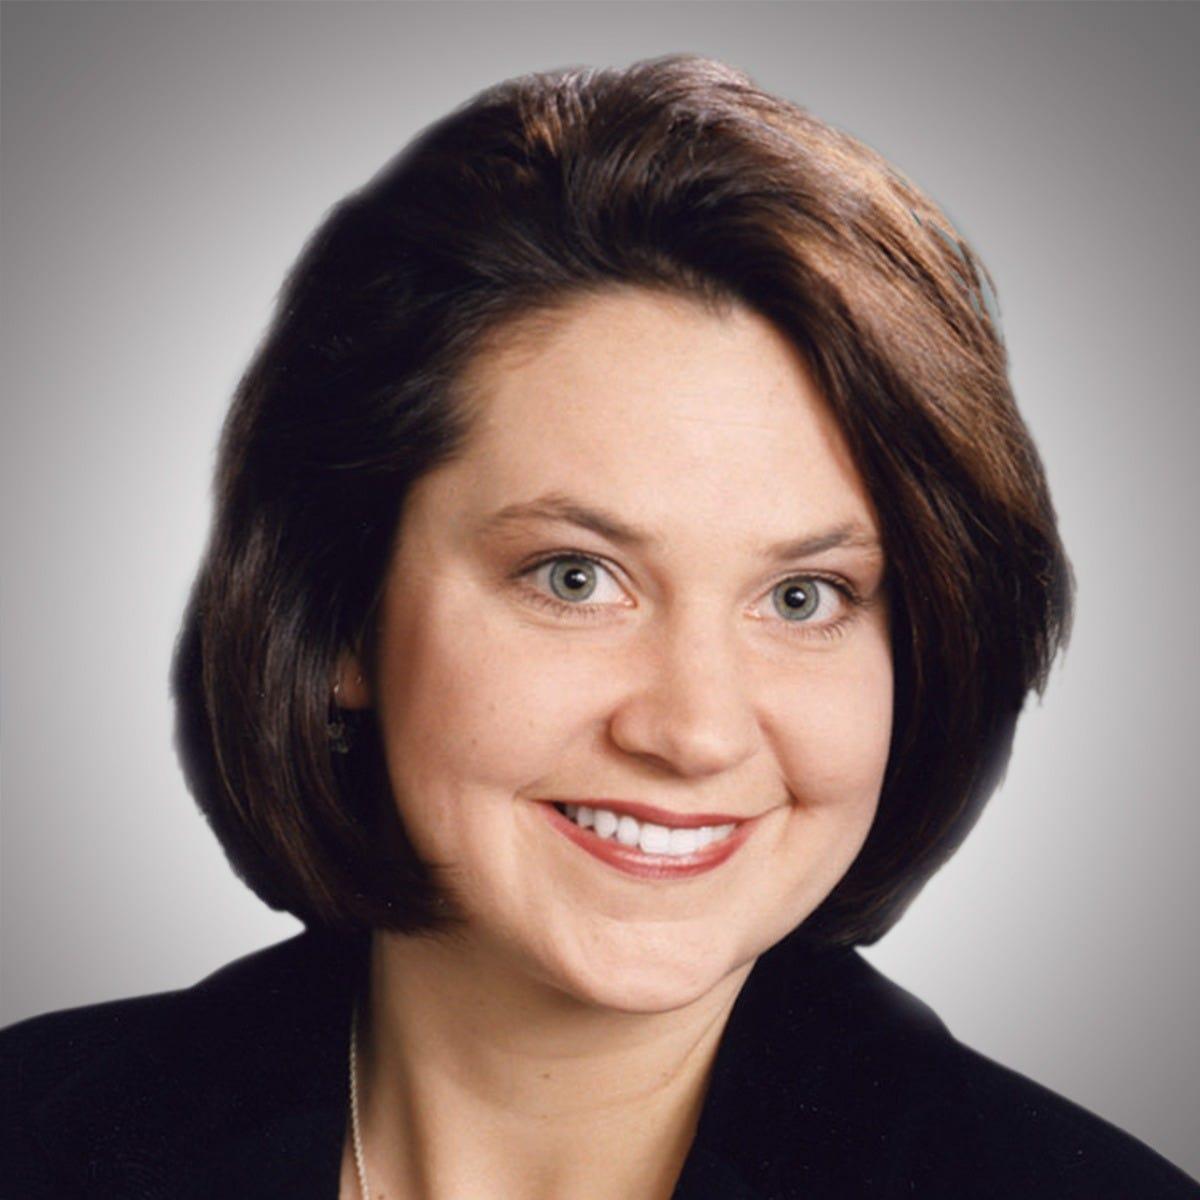 Dental Education Instructor - Jennifer Stutz, RDH